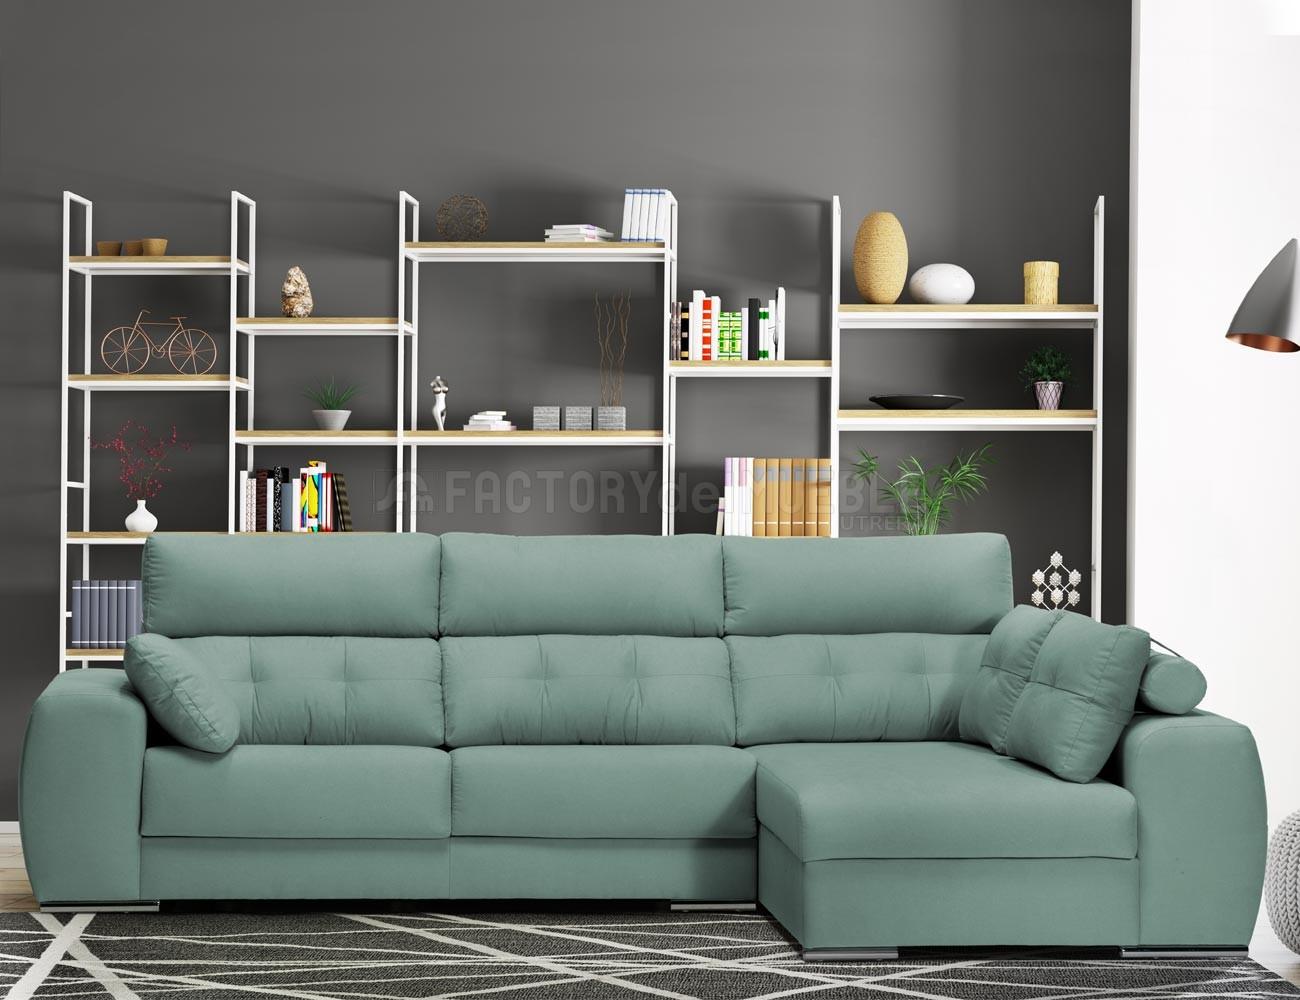 Sofa chaiselongue valetta